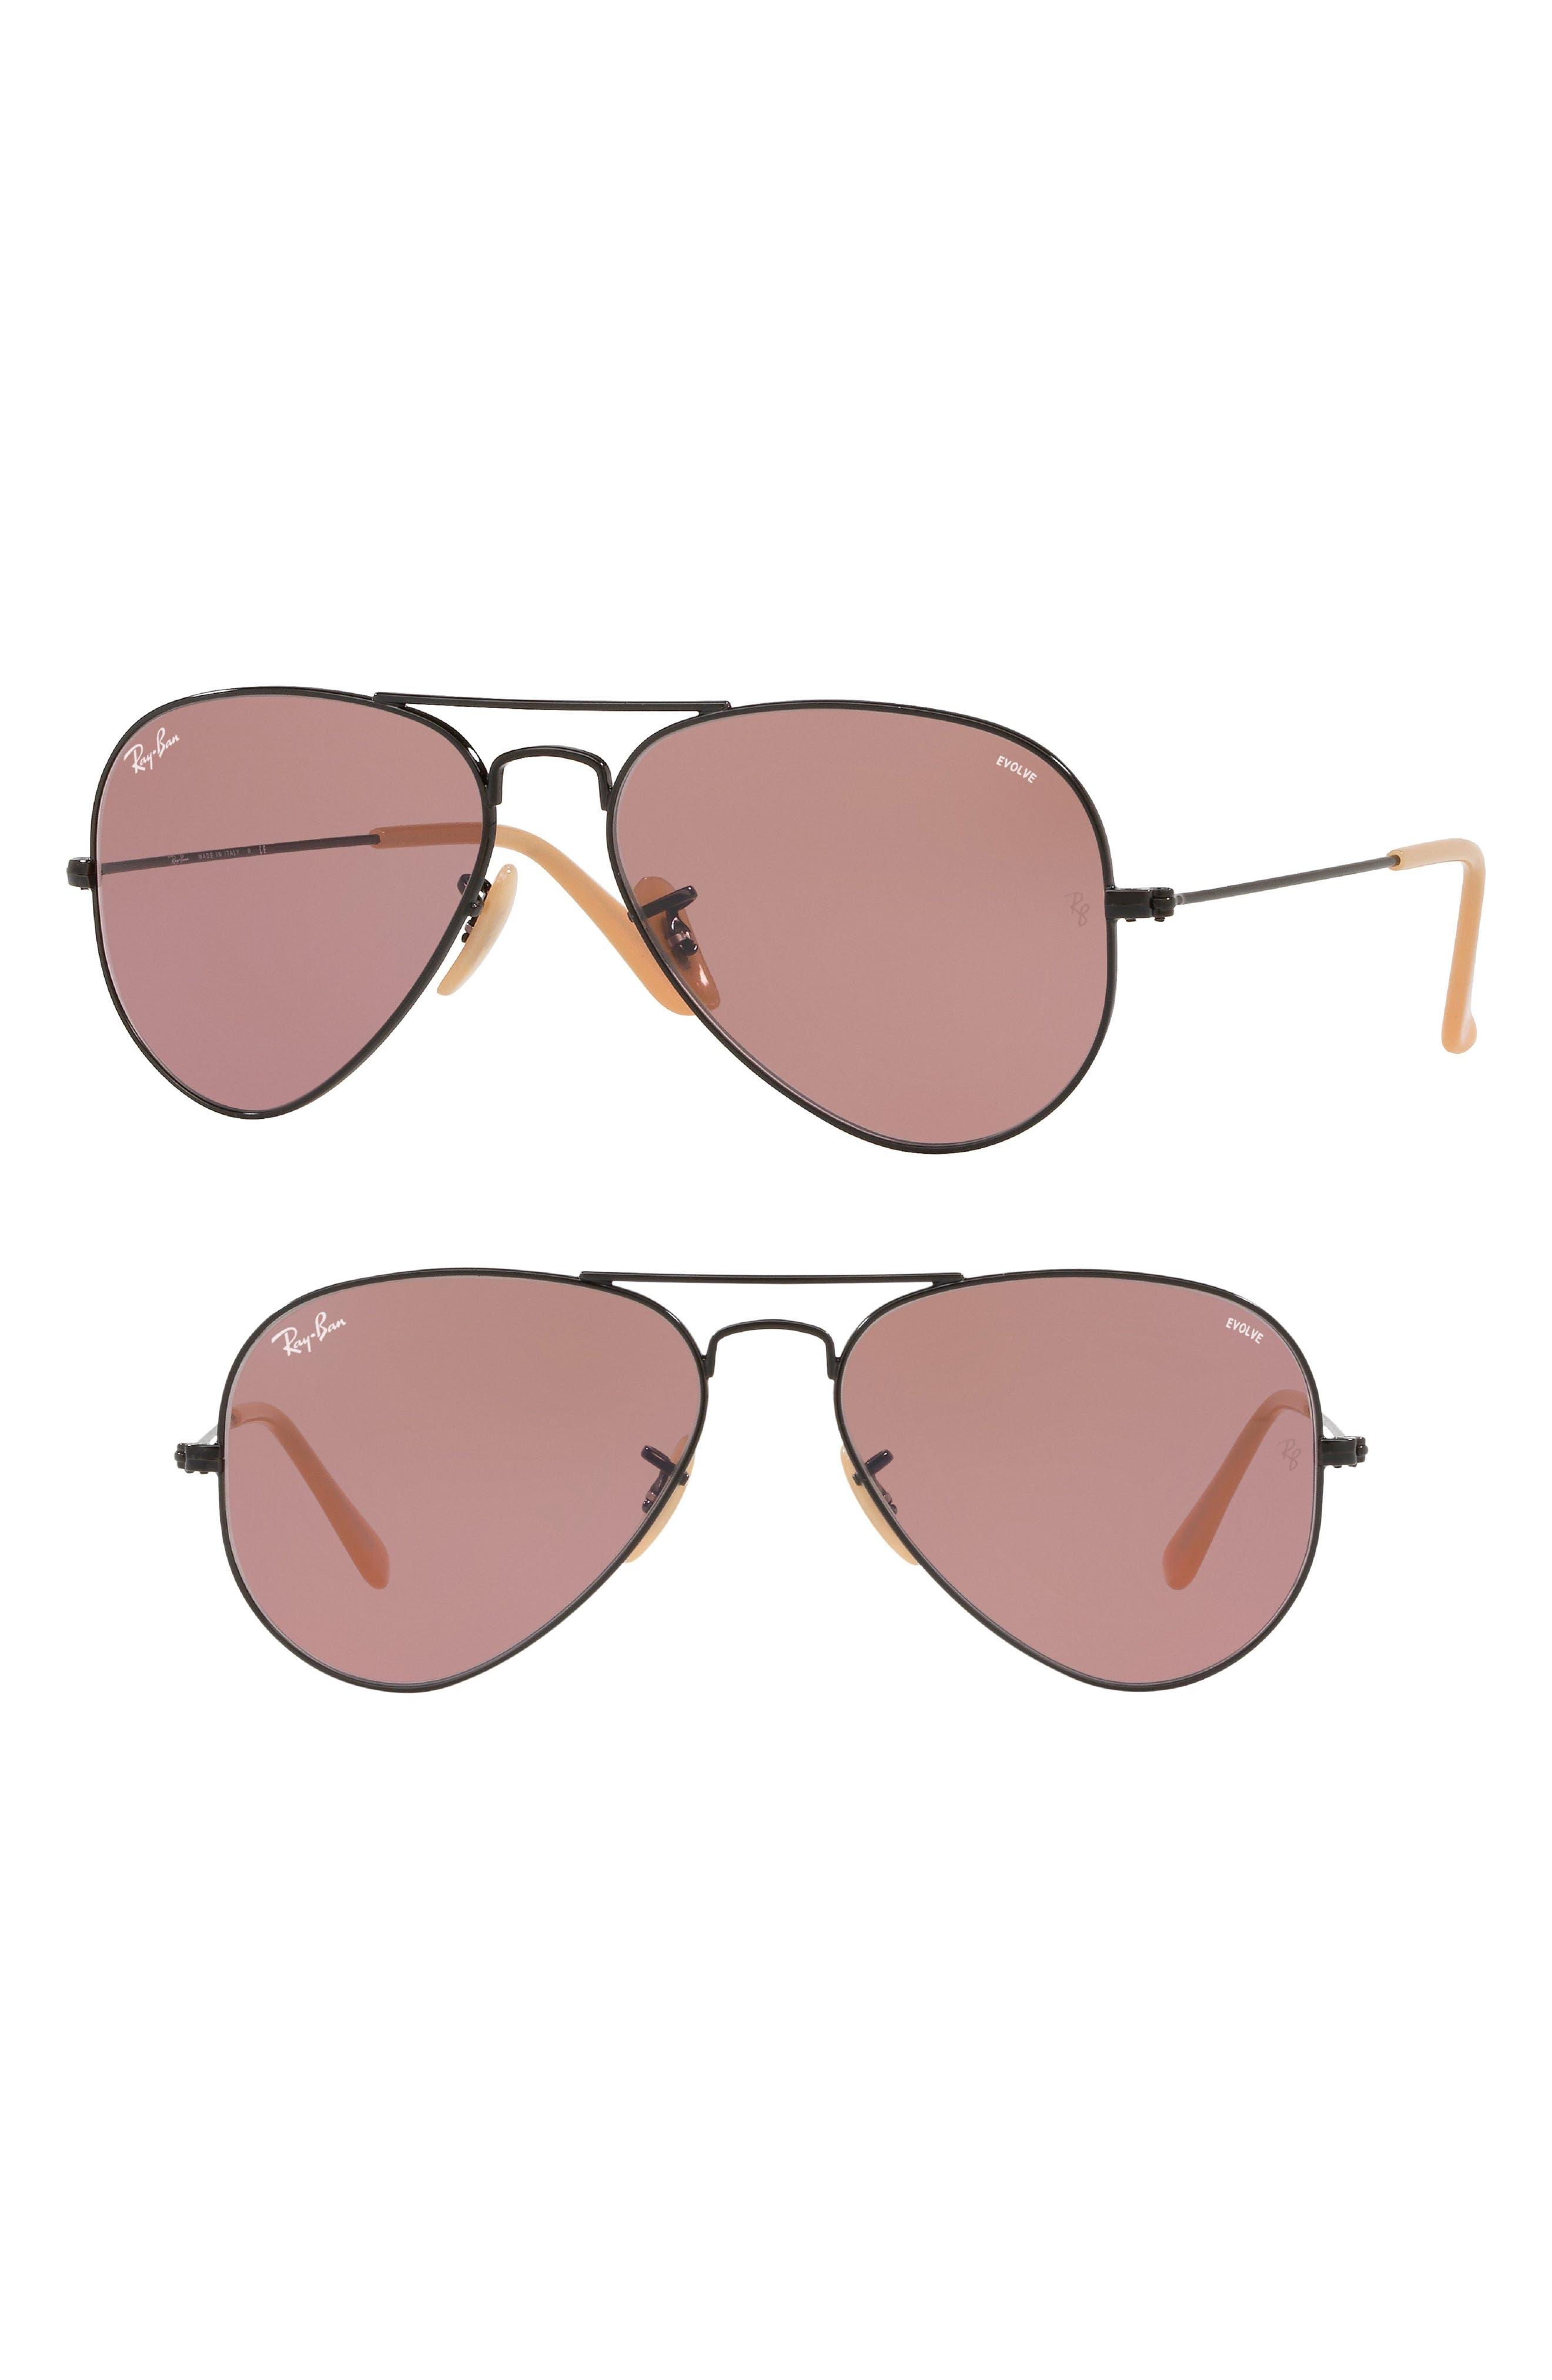 58mm Evolve Photochromic Aviator Sunglasses,                             Main thumbnail 1, color,                             001